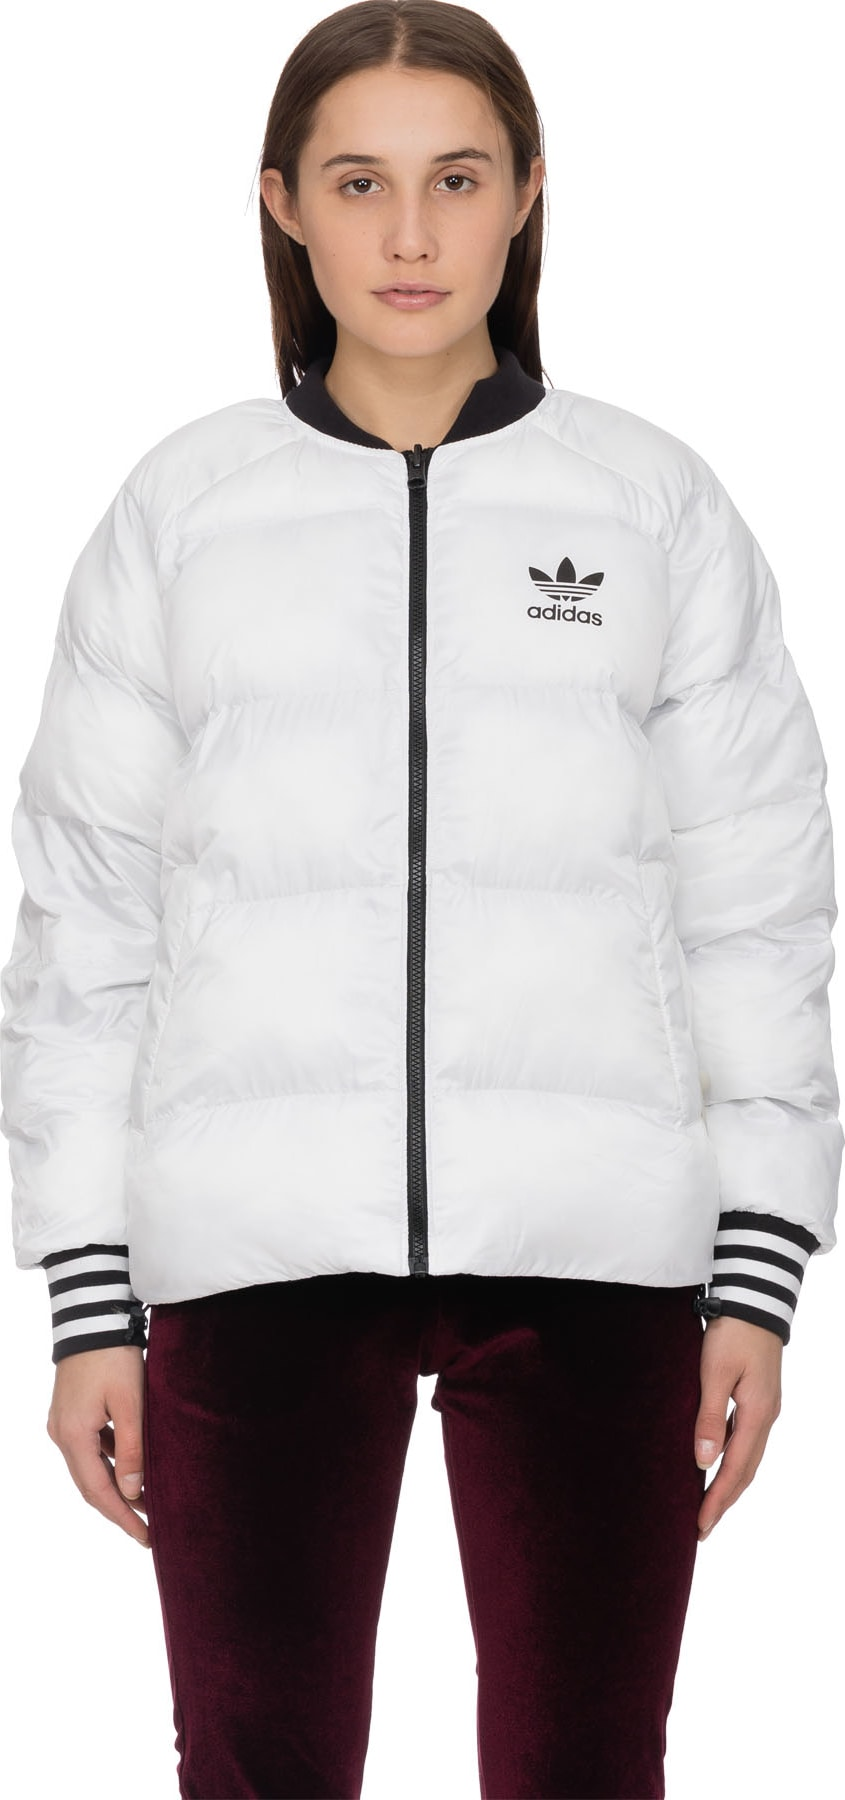 adidas Damen Jacken Zu verkaufen adidas SST Reversible